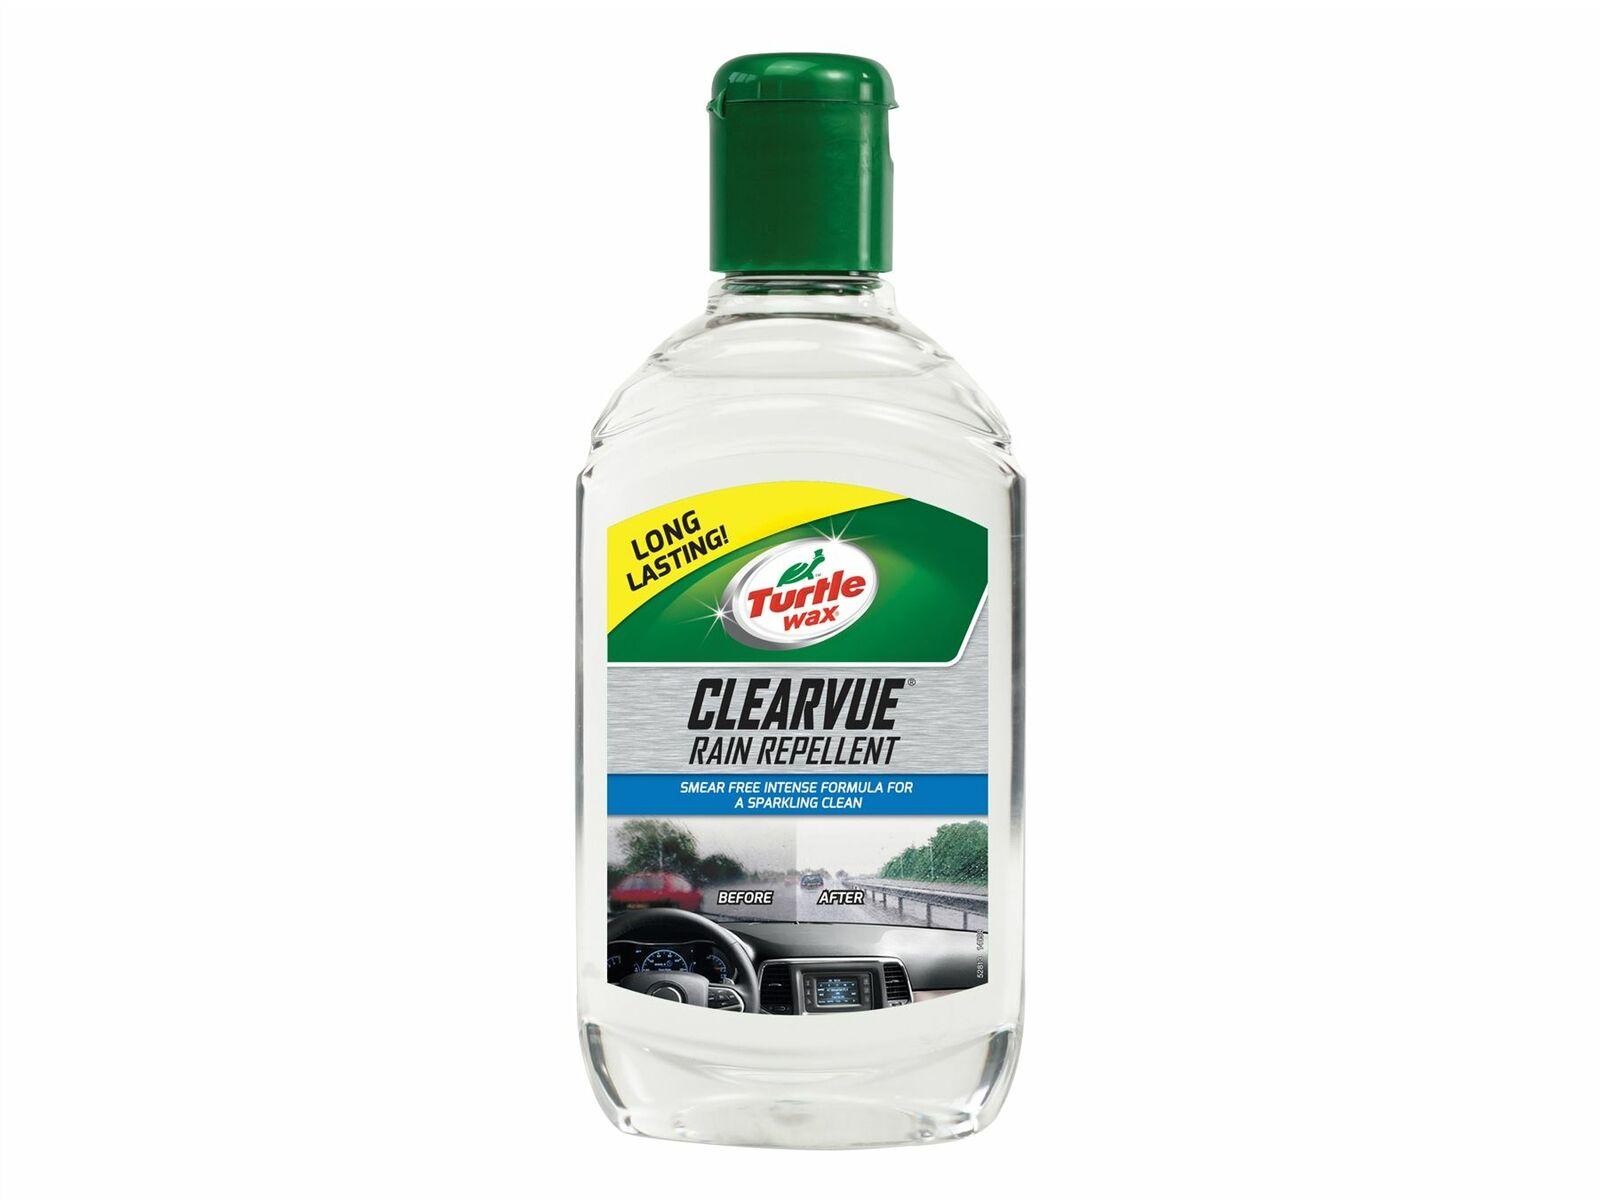 Clearvue Rain Repellent | Improves